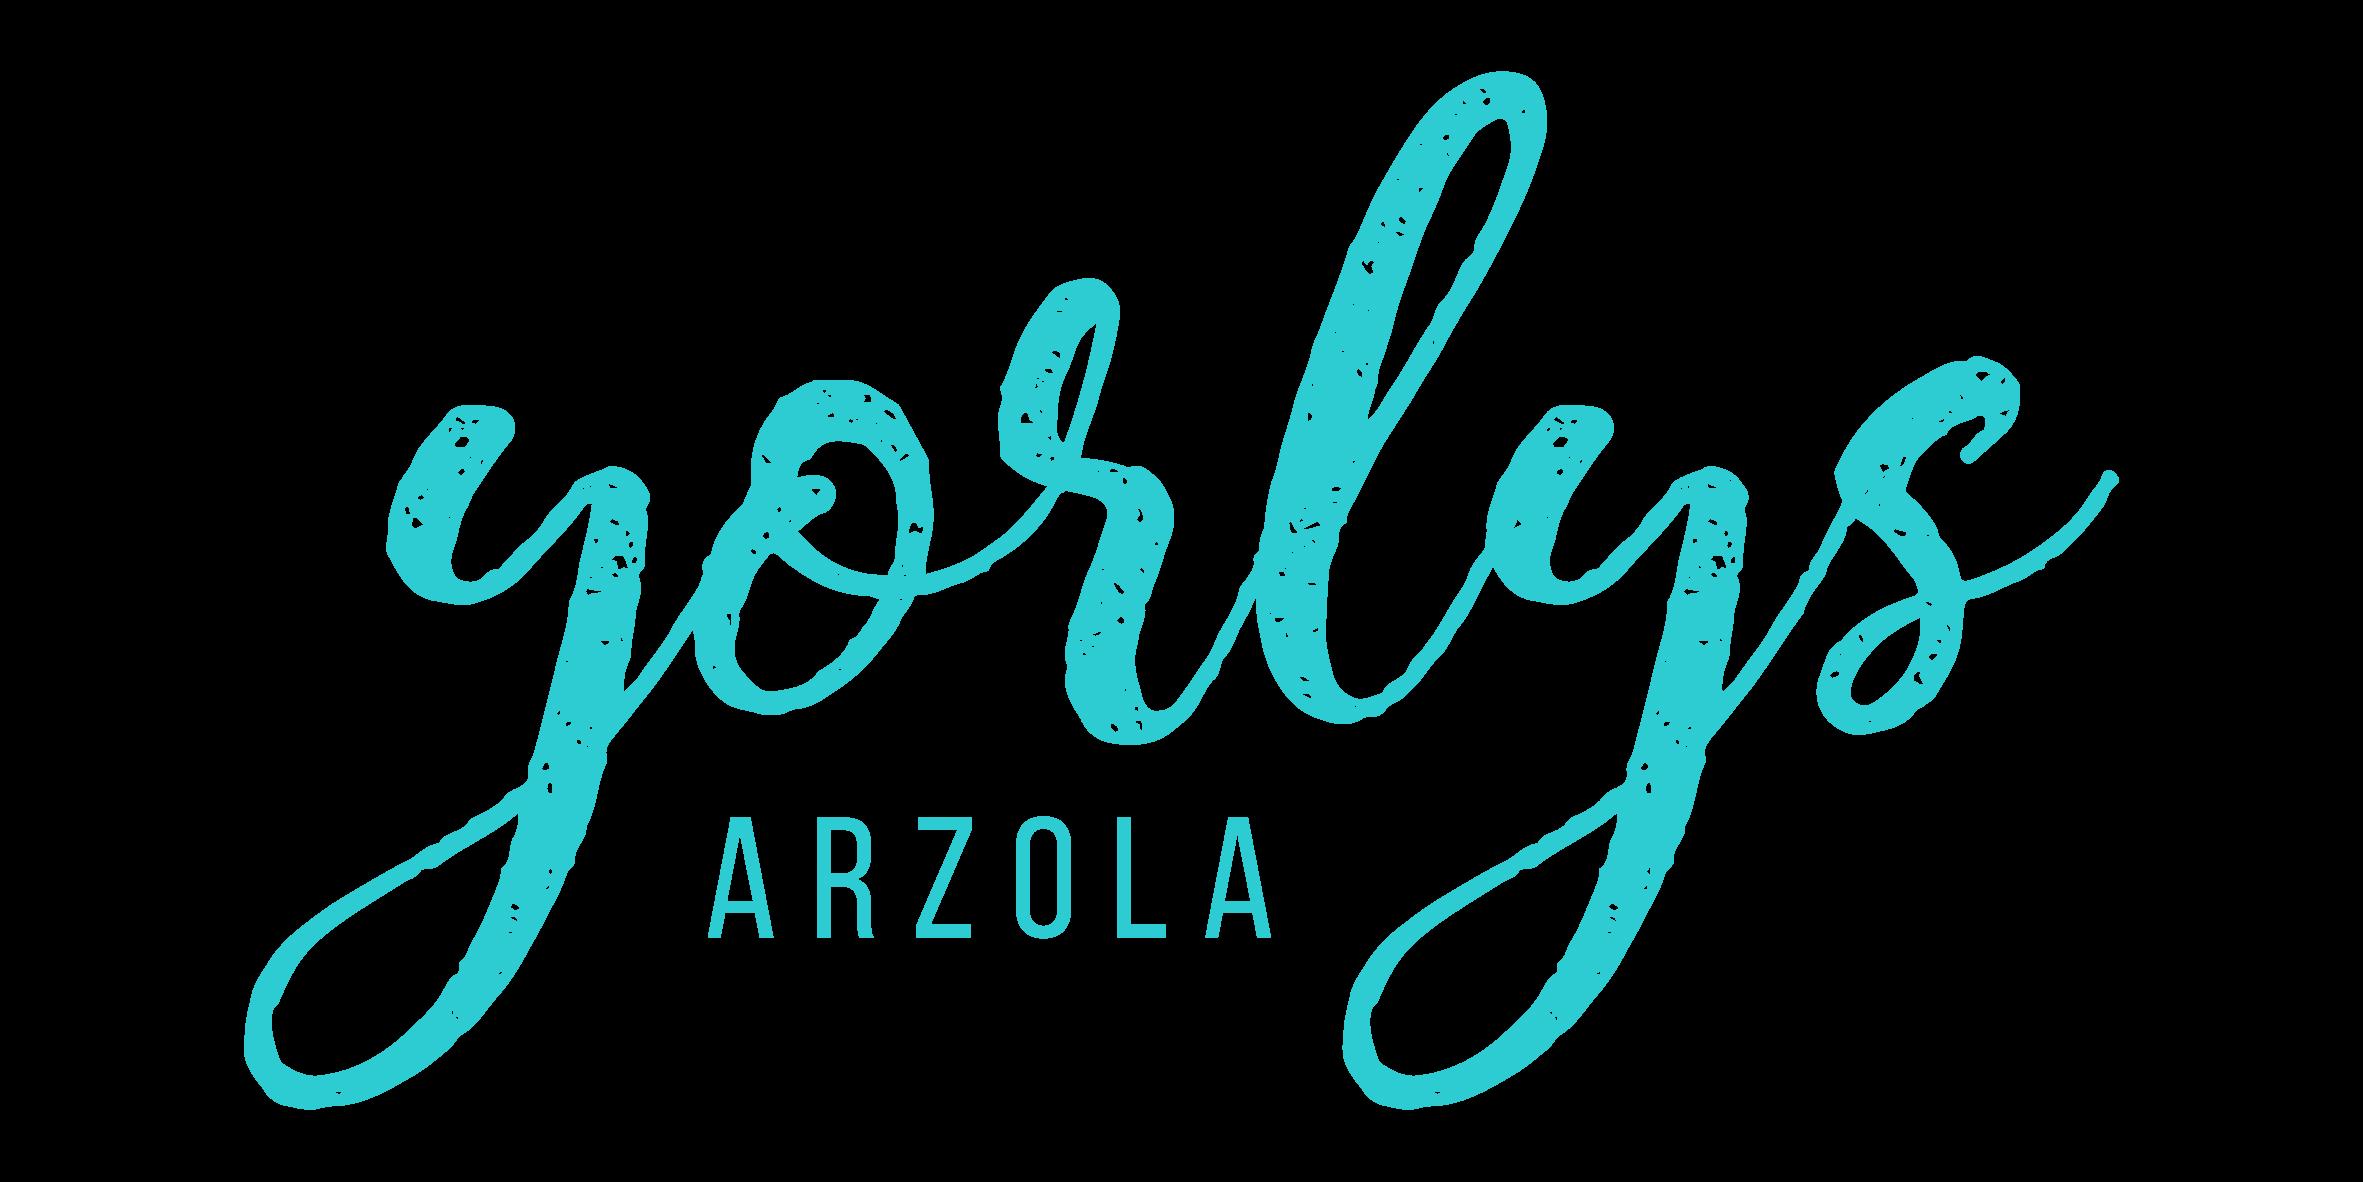 Yorlys Arzola